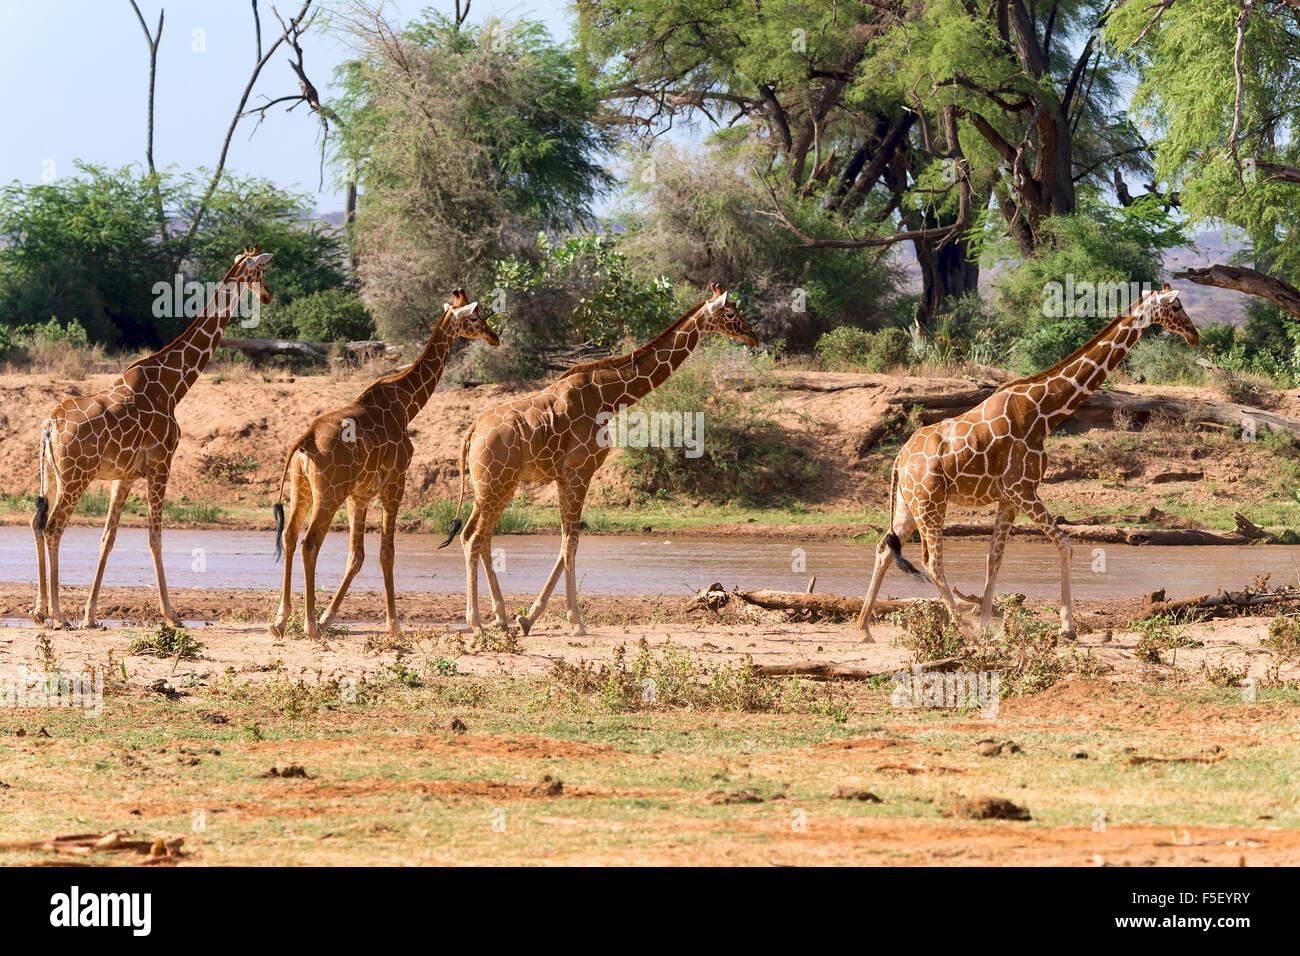 Reticulated giraffe or Somali giraffes (Giraffa reticulata camelopardalis) running along river, Samburu National Reserve, Kenya Stock Photo